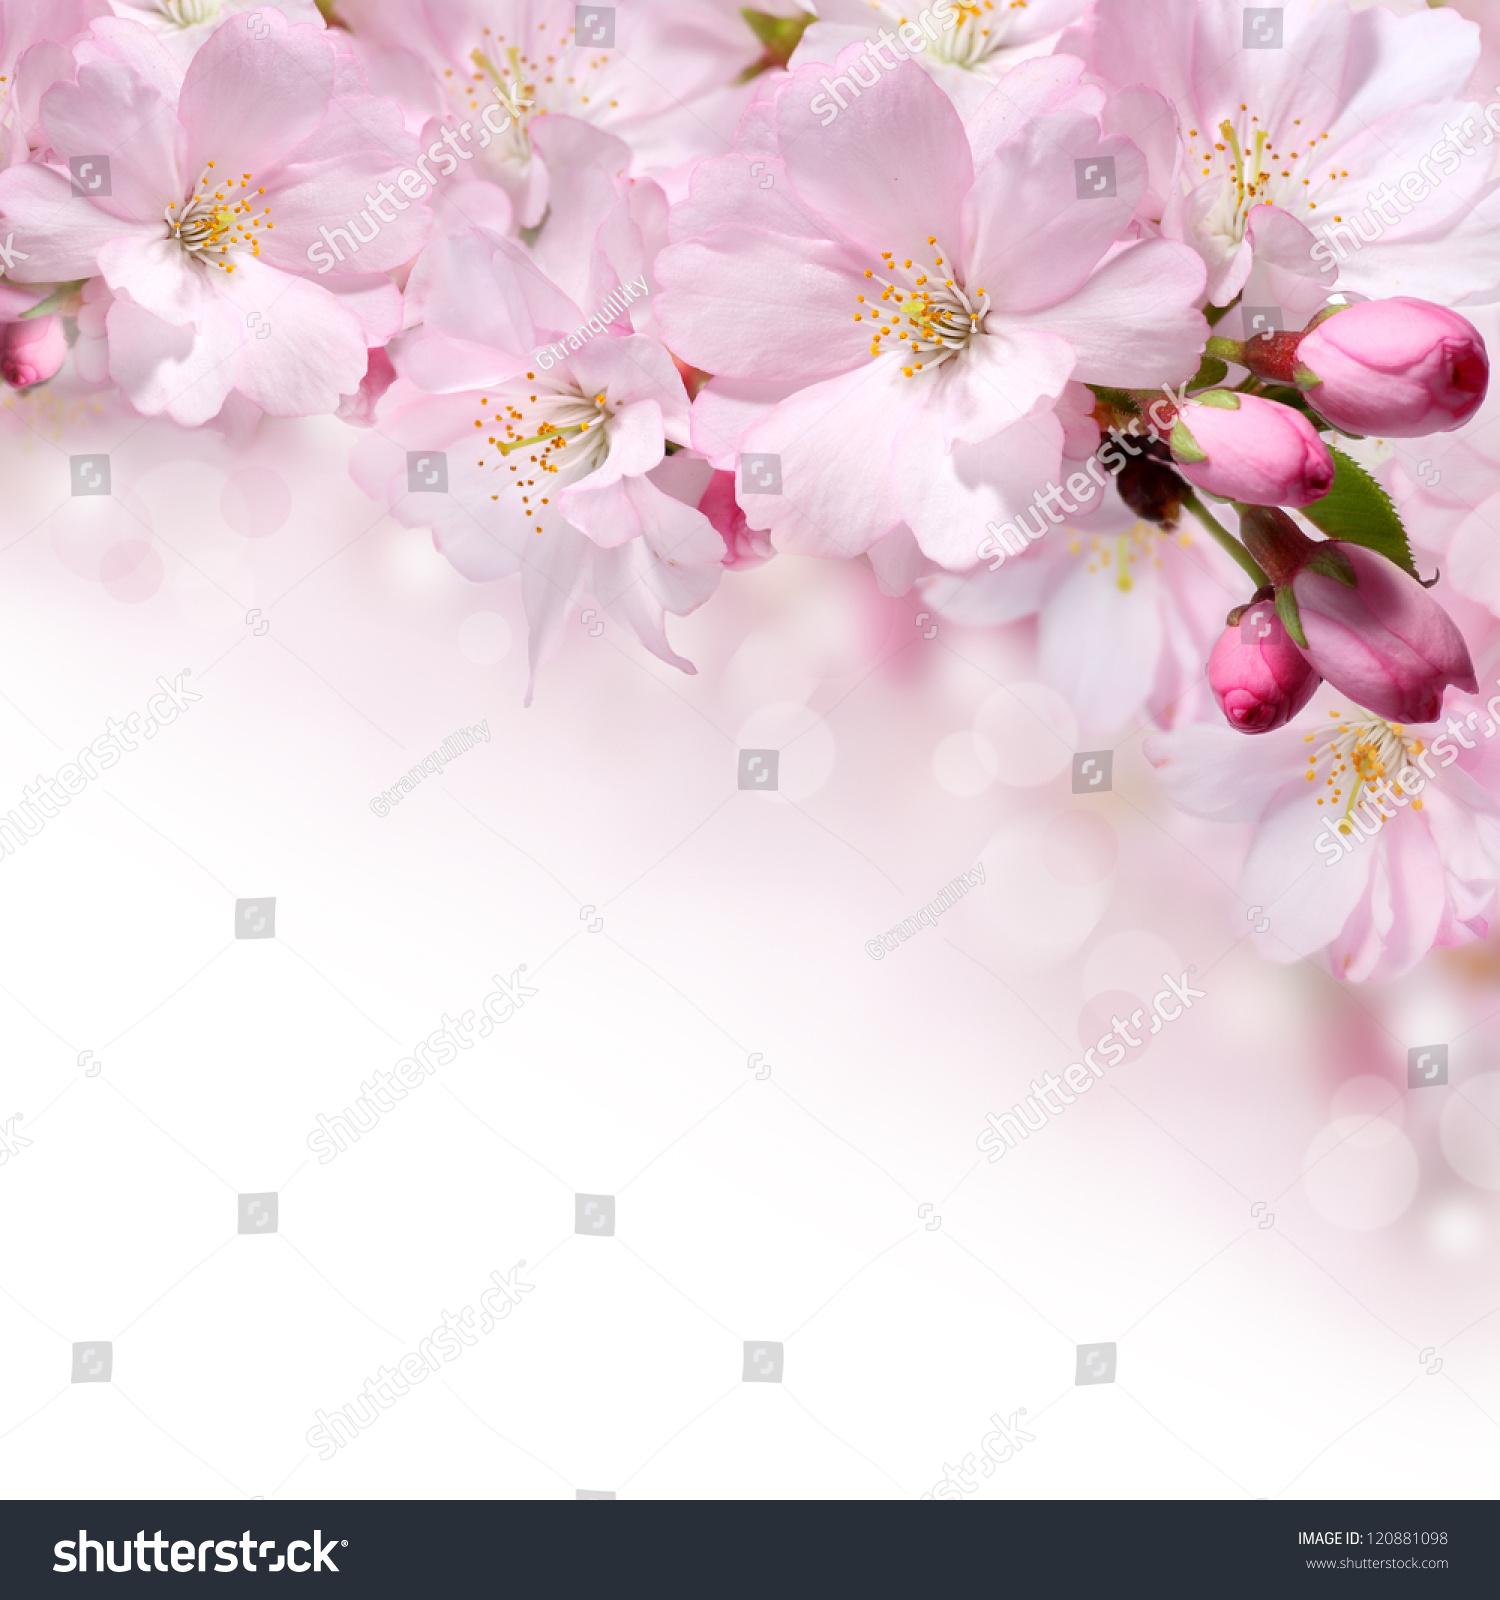 spring flower wallpaper pink - photo #35